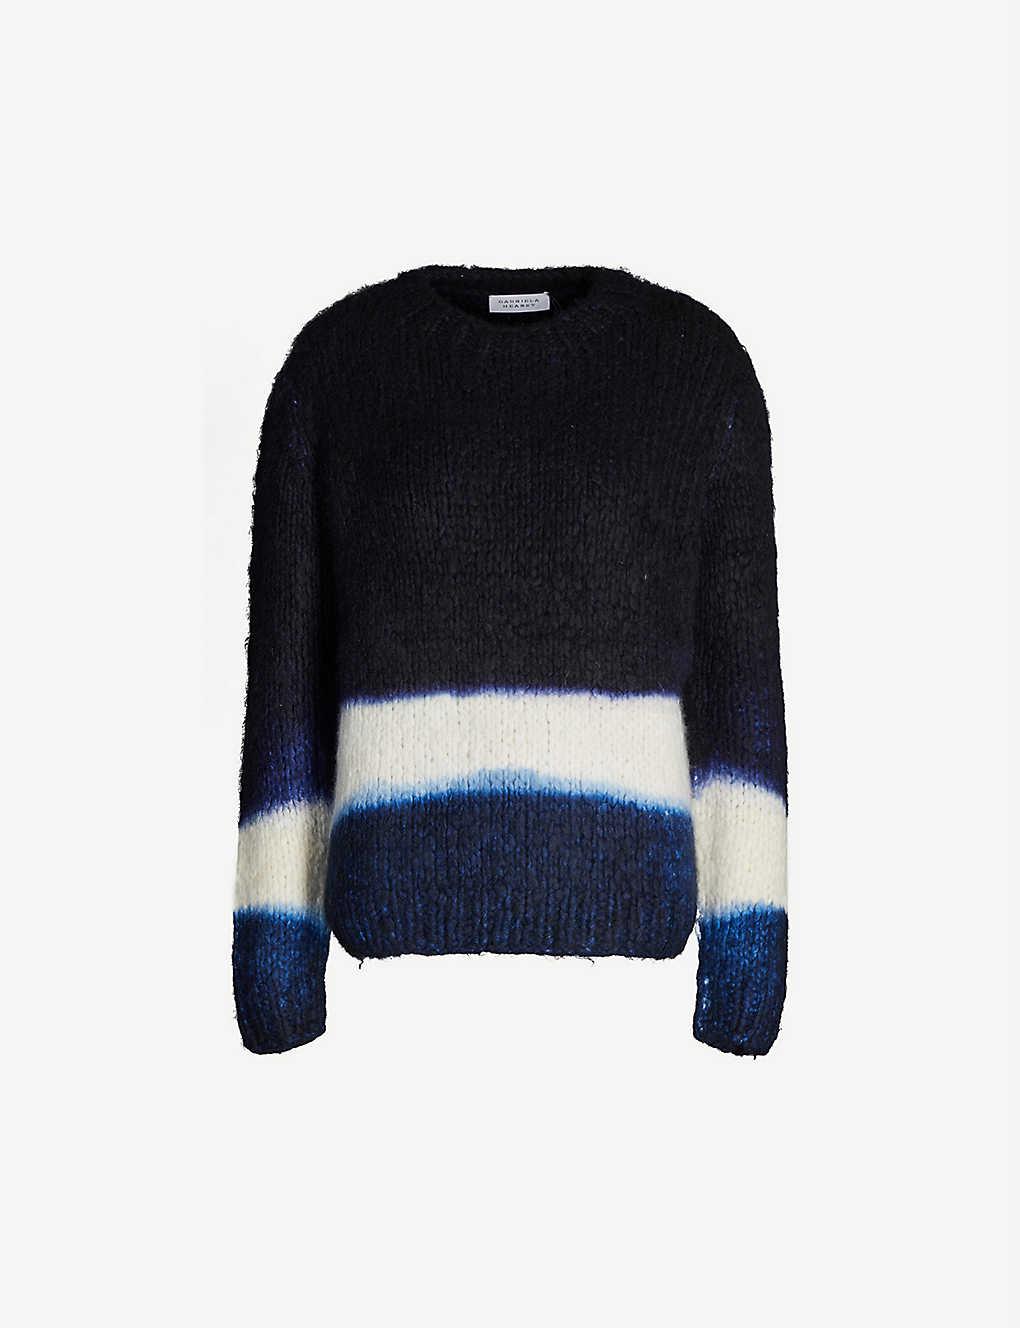 Gabriela Hearst Knits Lawrence striped cashmere jumper